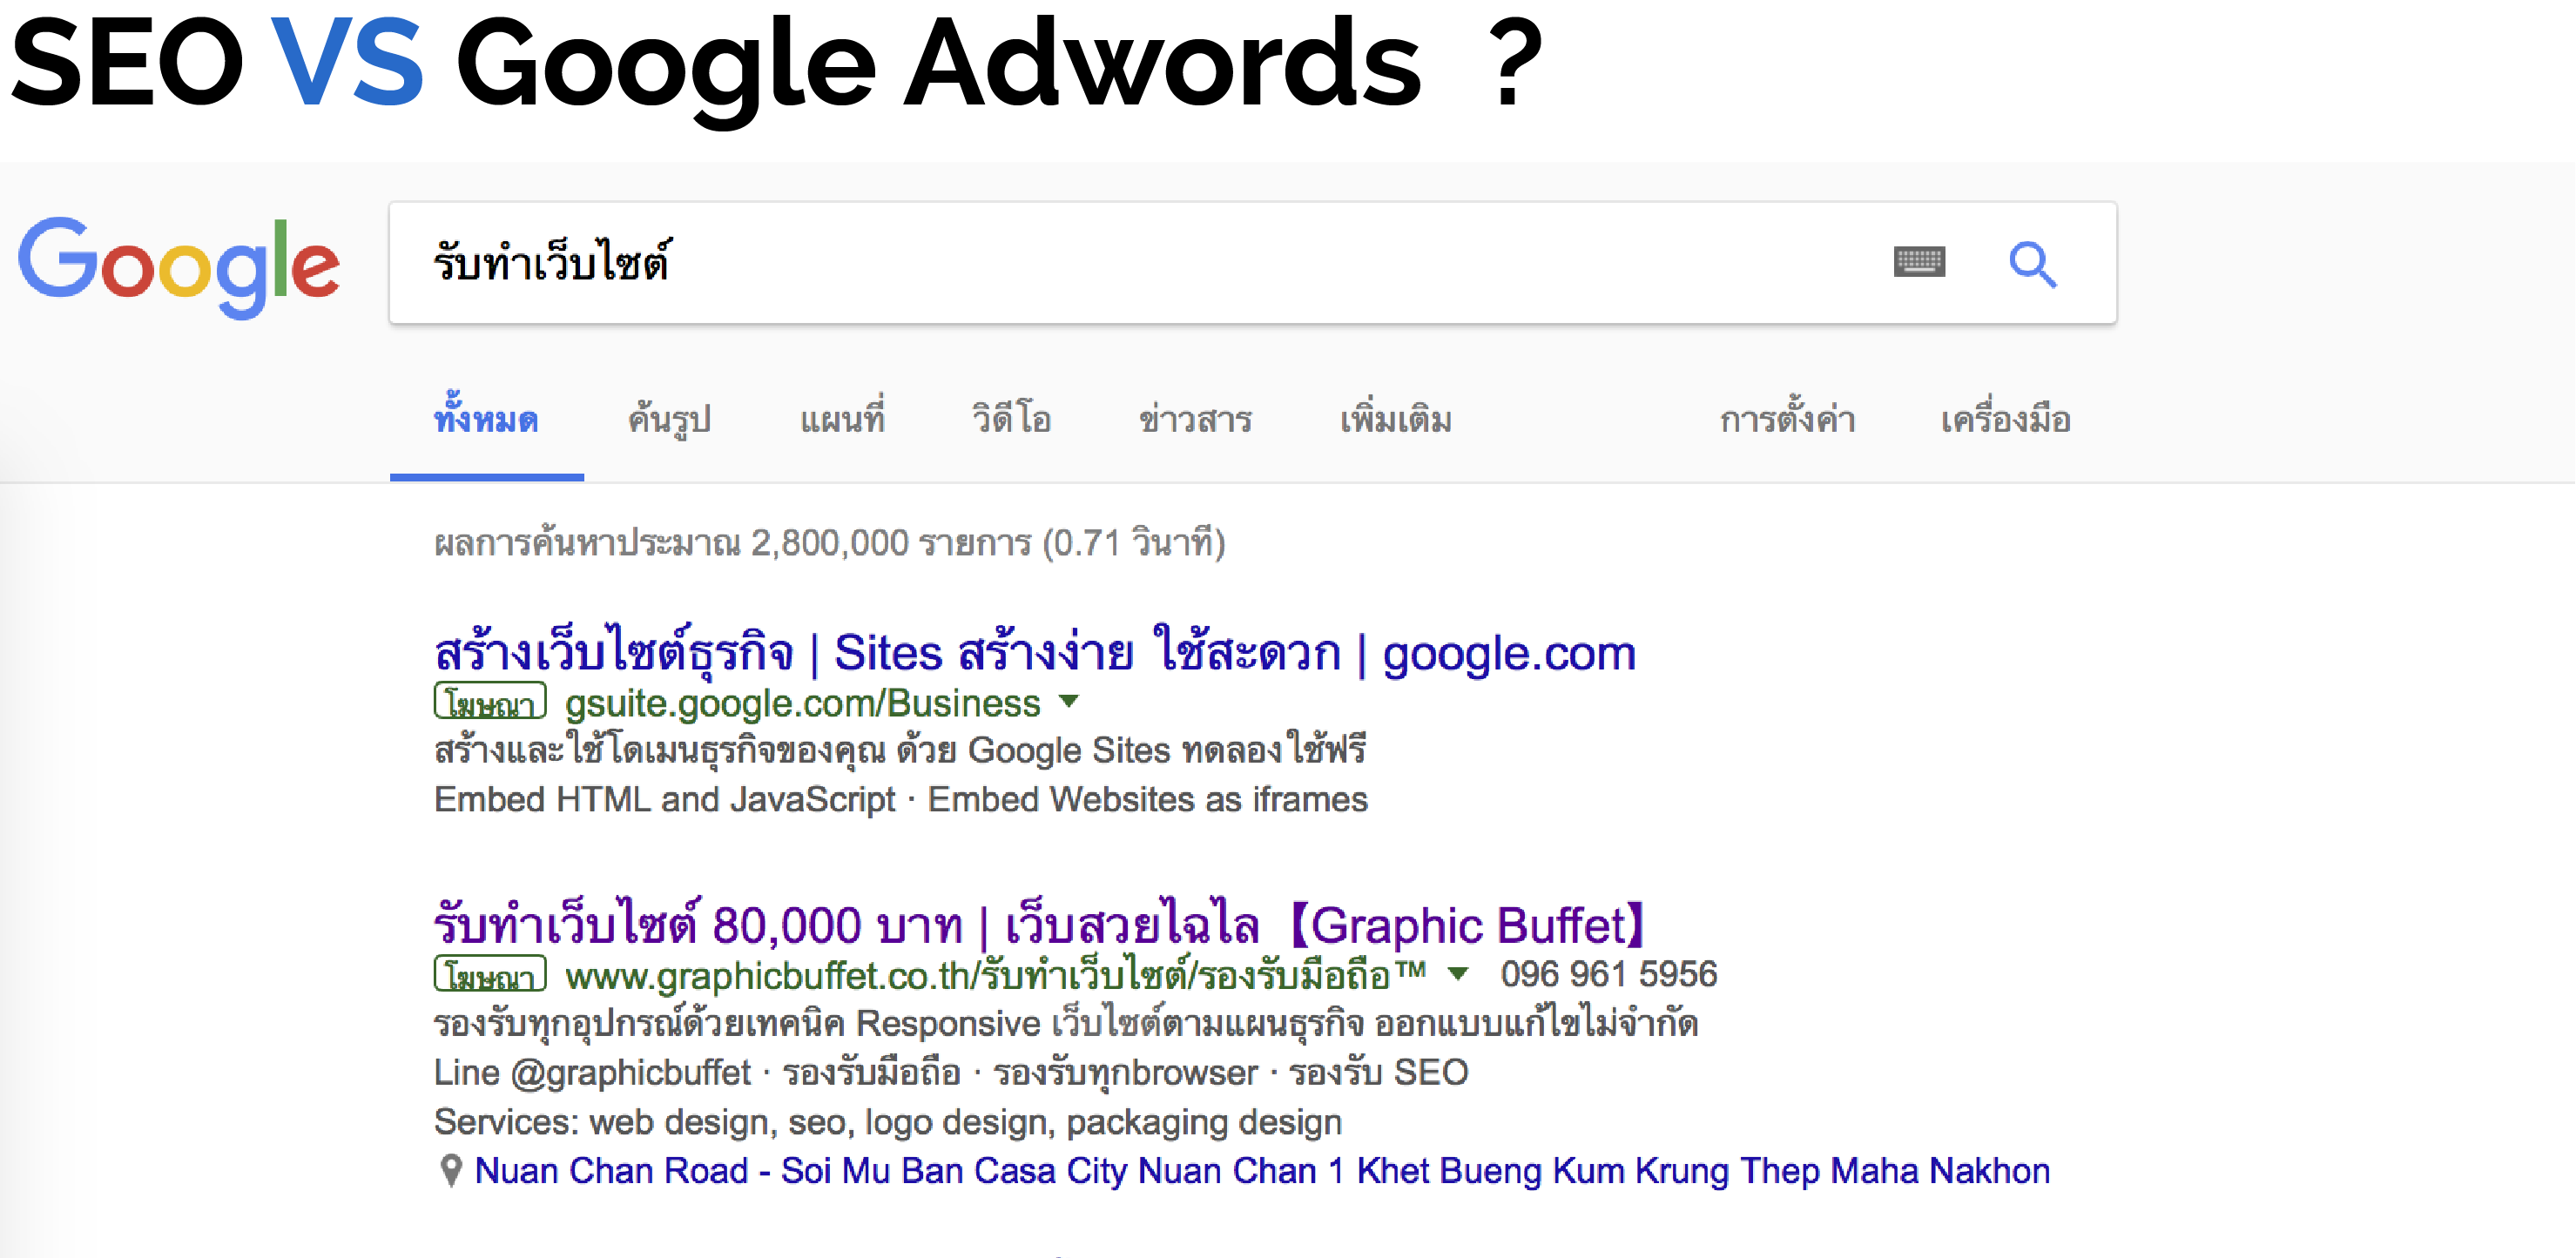 SEO VS Google Adwords ทำ SEO หรือซื้อโฆษณาใน Google Adwords แบบไหนดีกว่ากัน